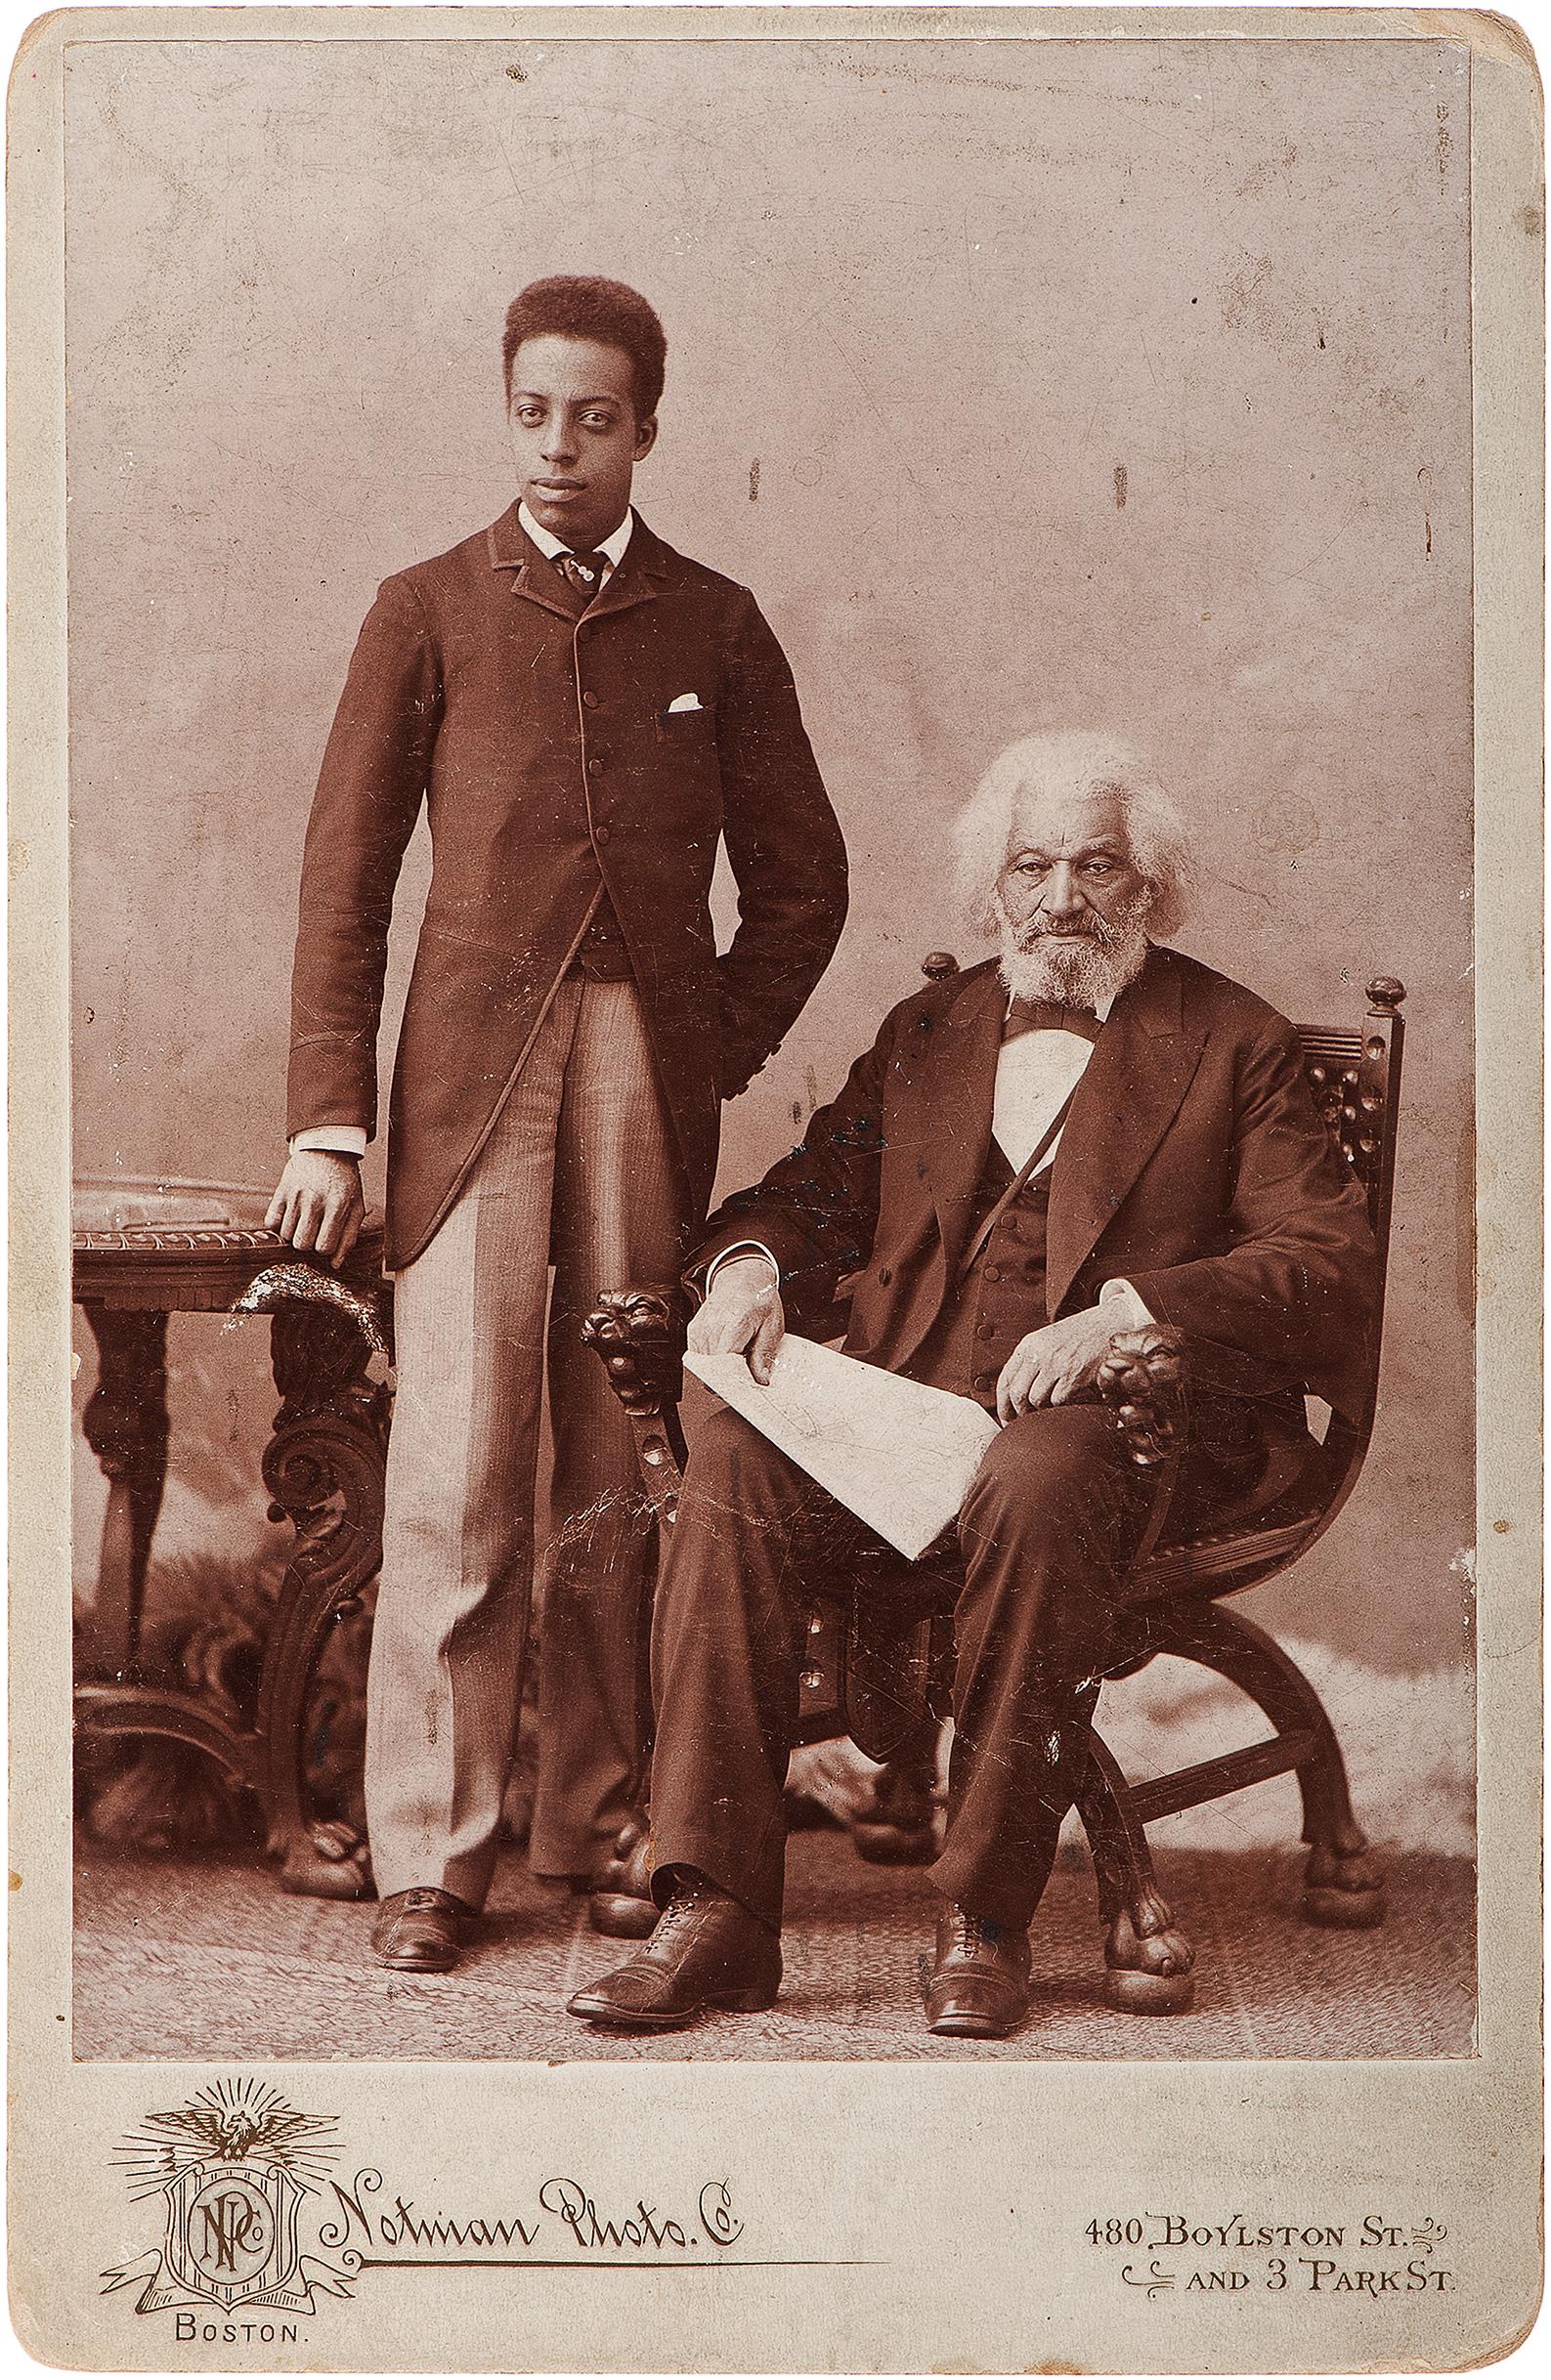 ab85e8d91 File:Frederick Douglass & grandson Joseph, c1890s.jpg - Wikimedia ...